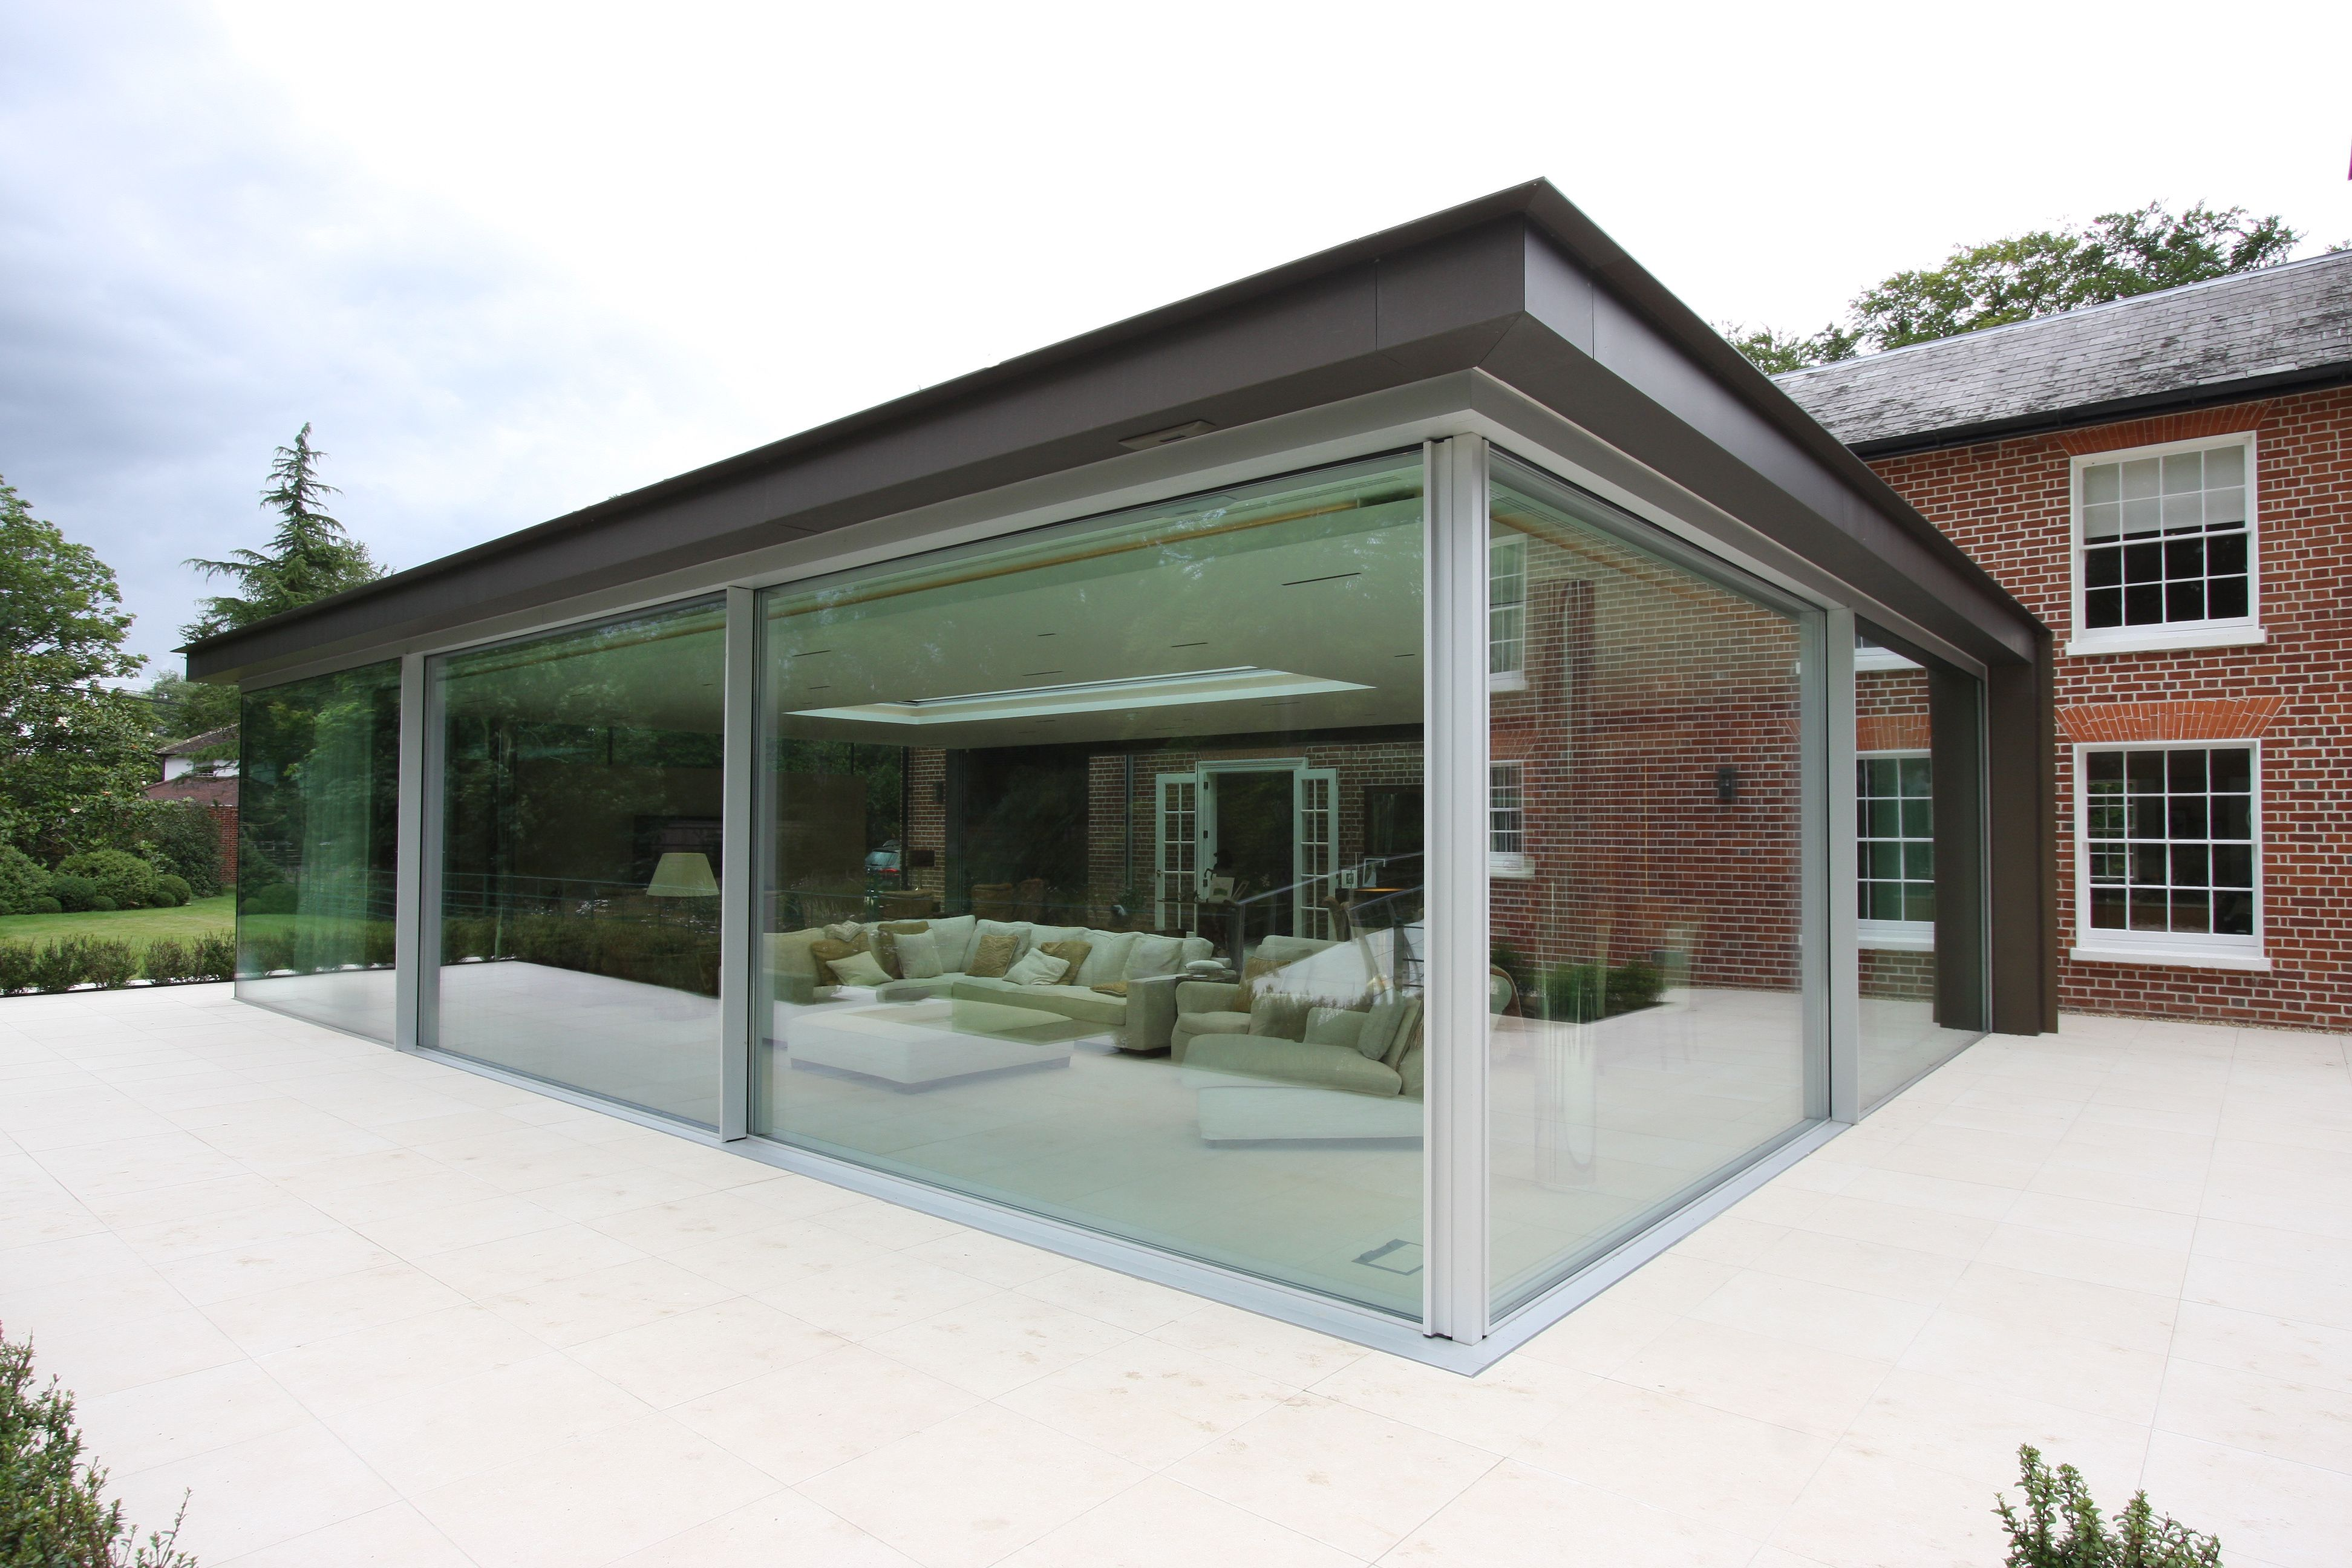 Triple Glazed Slim Frame Sliding Glass Doors Great Windows